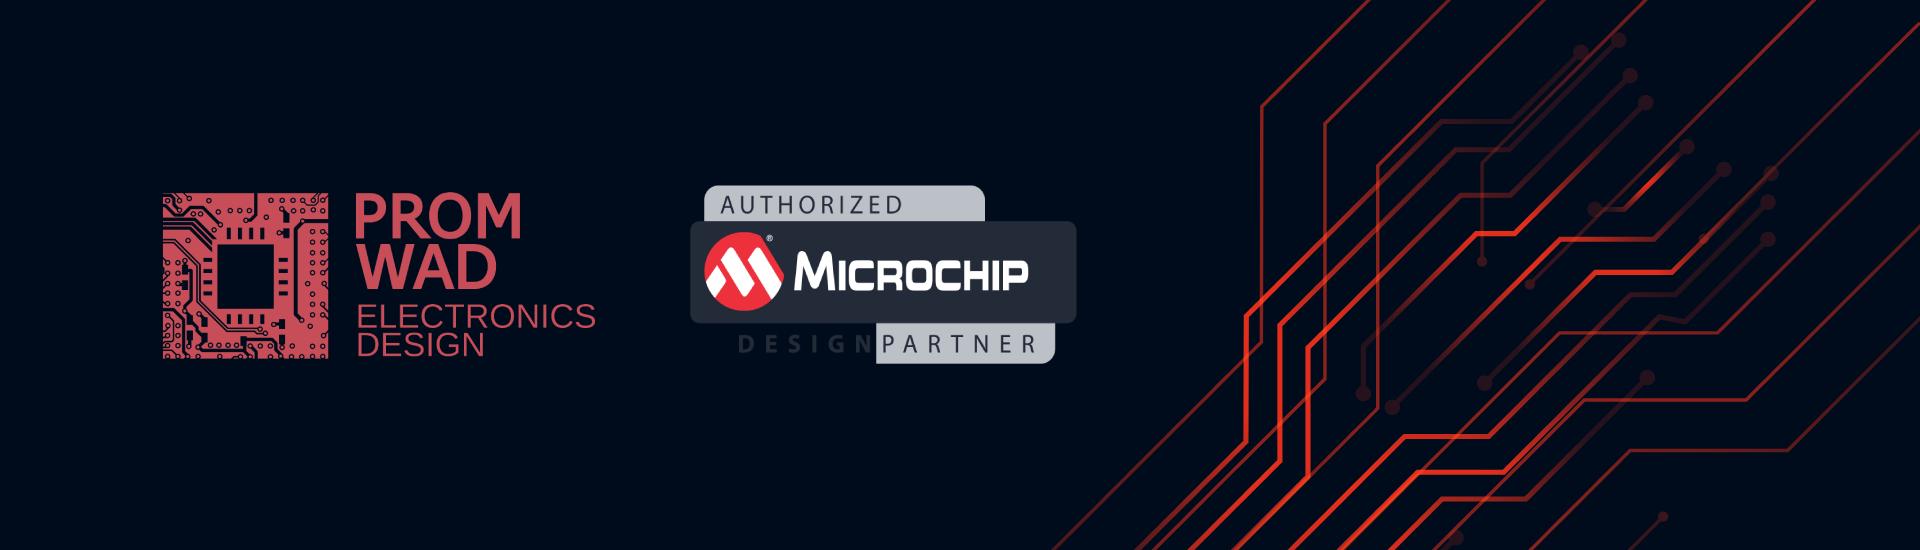 promwad microchip partner ecosystem